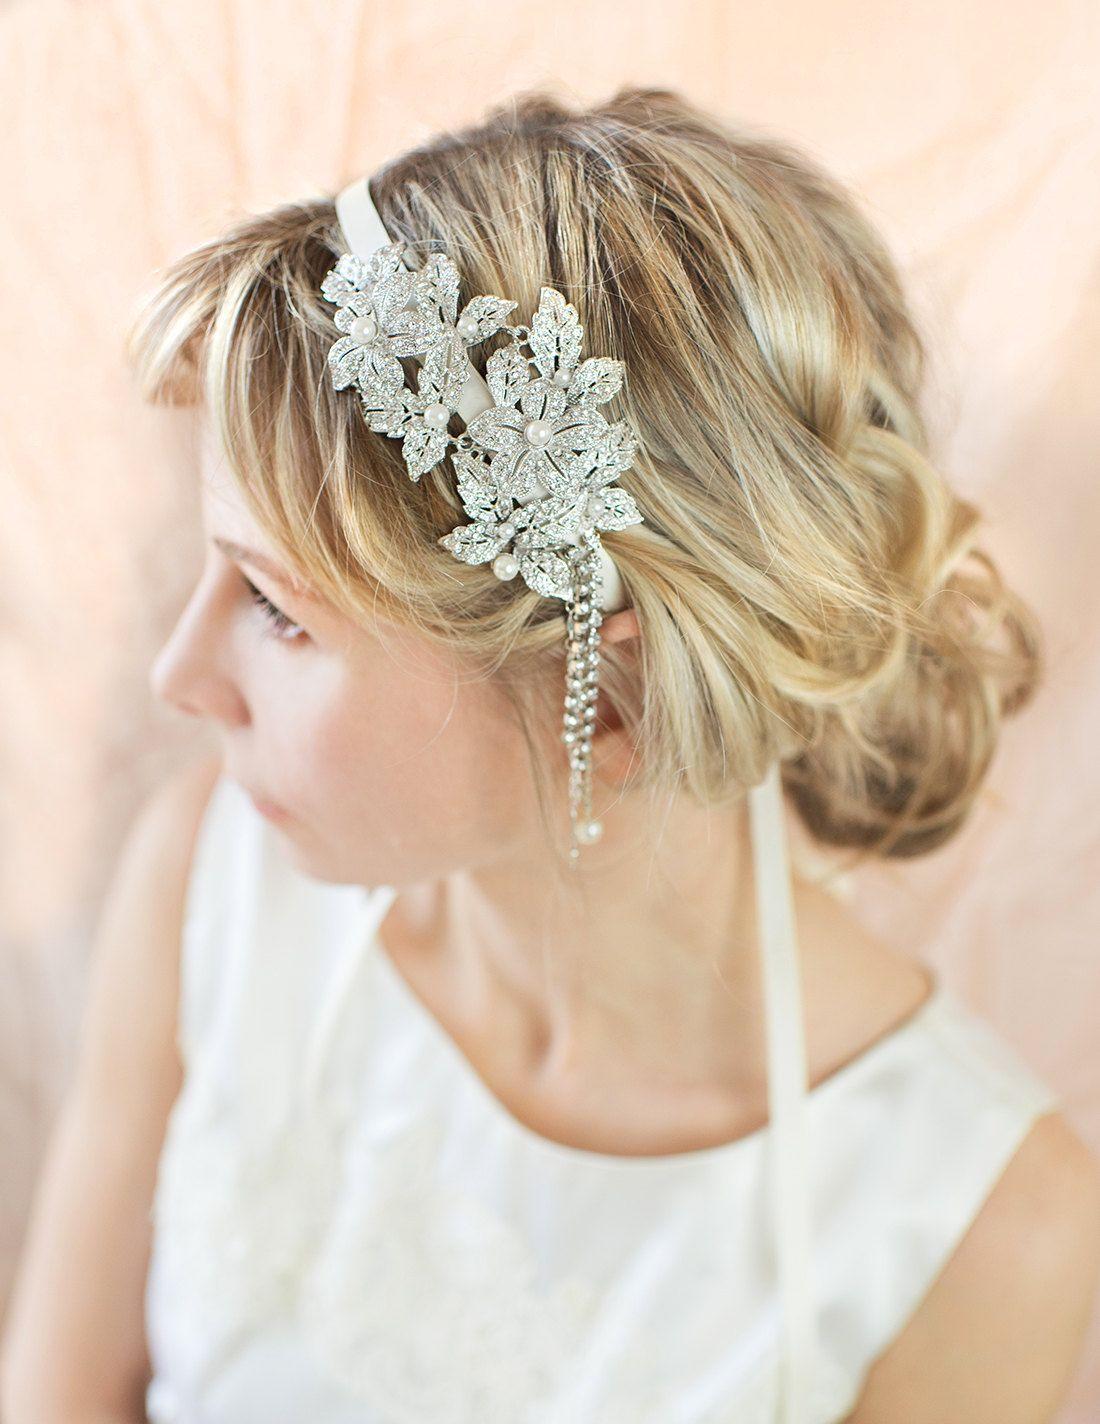 1920s gatsby inspired wedding hairstyles | hairstyles | pinterest